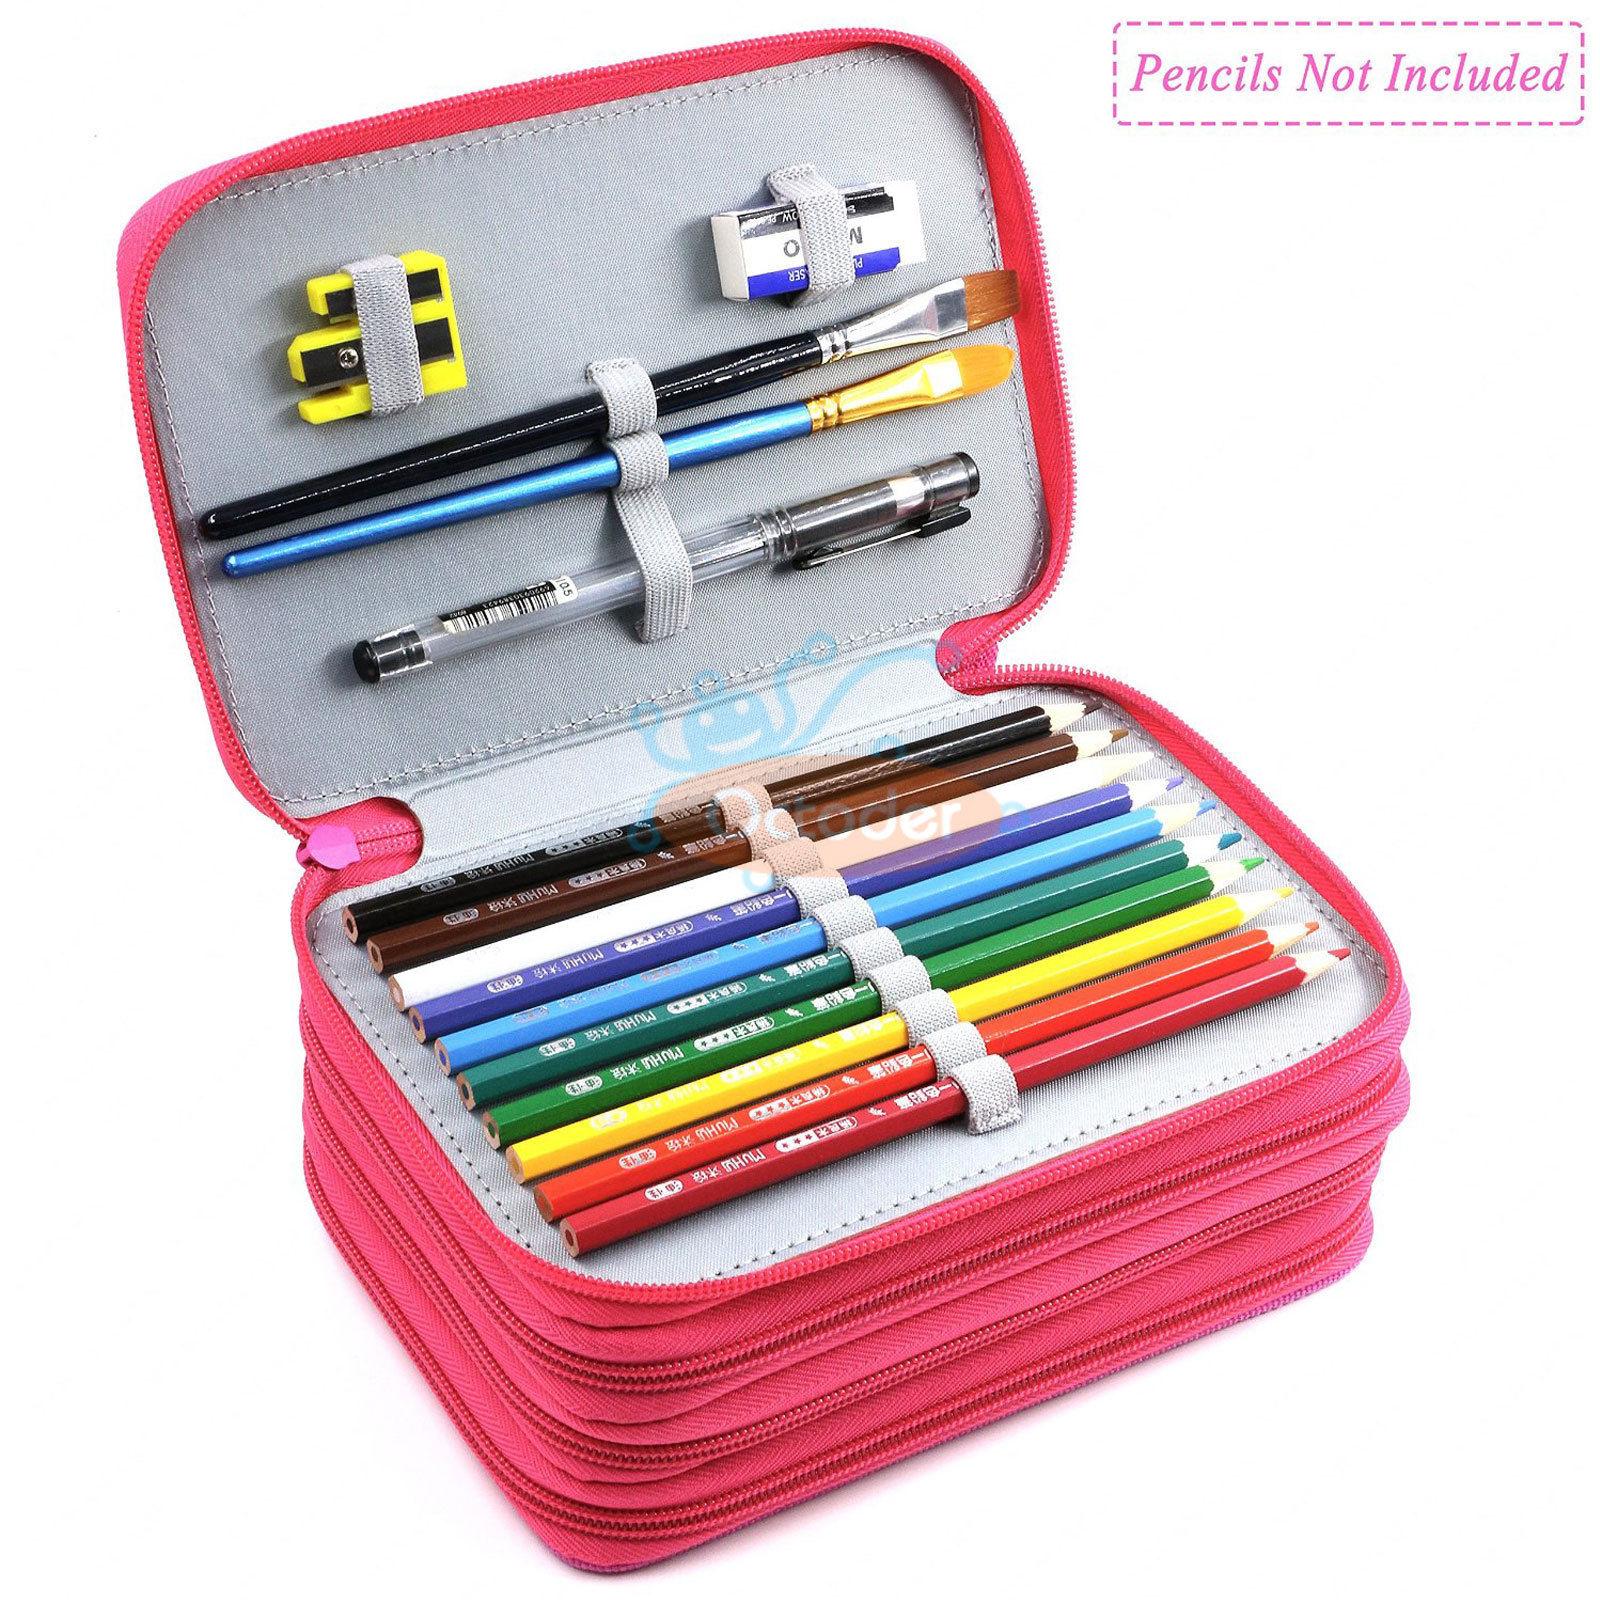 4-Layers-High-Capacity-Pencil-Brush-Case-Box-Pen-Pouch-Bag-Makeup-Storage-Bag thumbnail 17